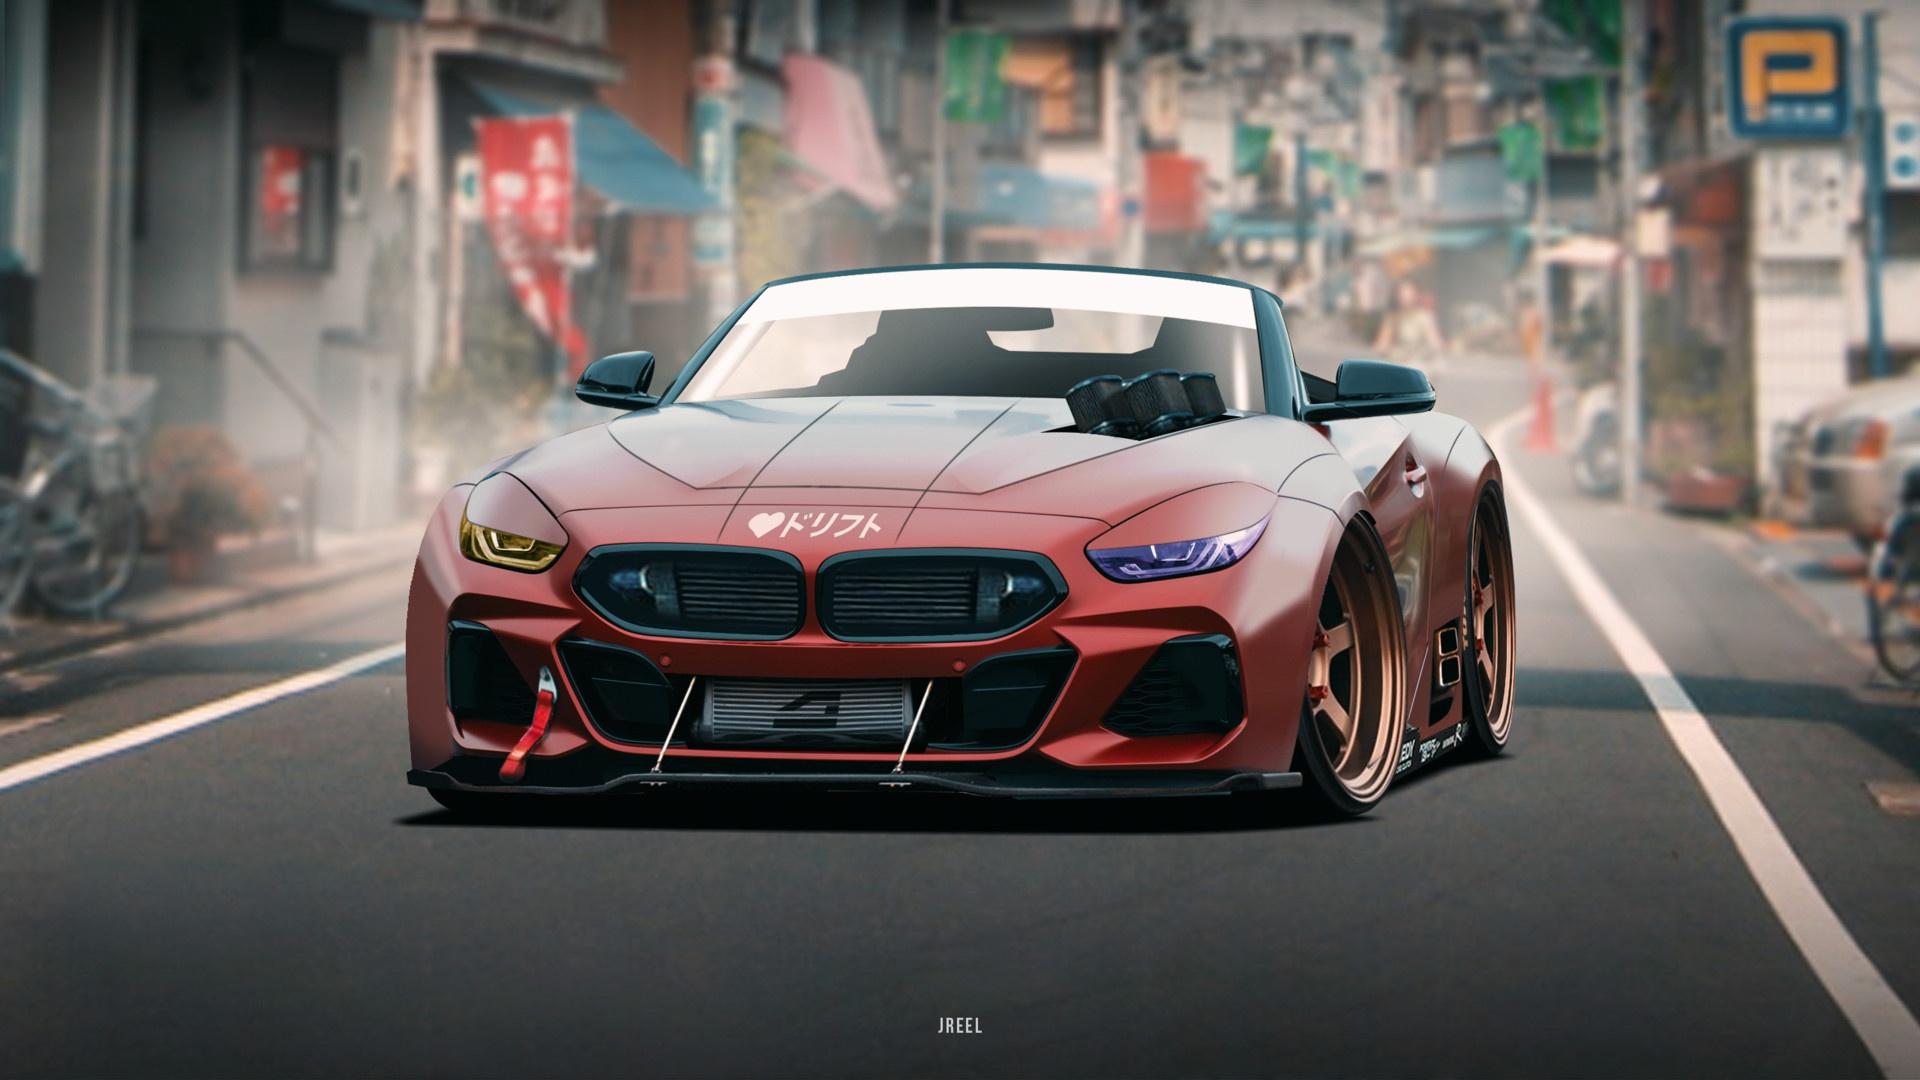 Artwork Car Red Cars Vehicle Bmw Bmw Z4 Colored Wheels Wallpaper Resolution 1920x1080 Id 307985 Wallha Com